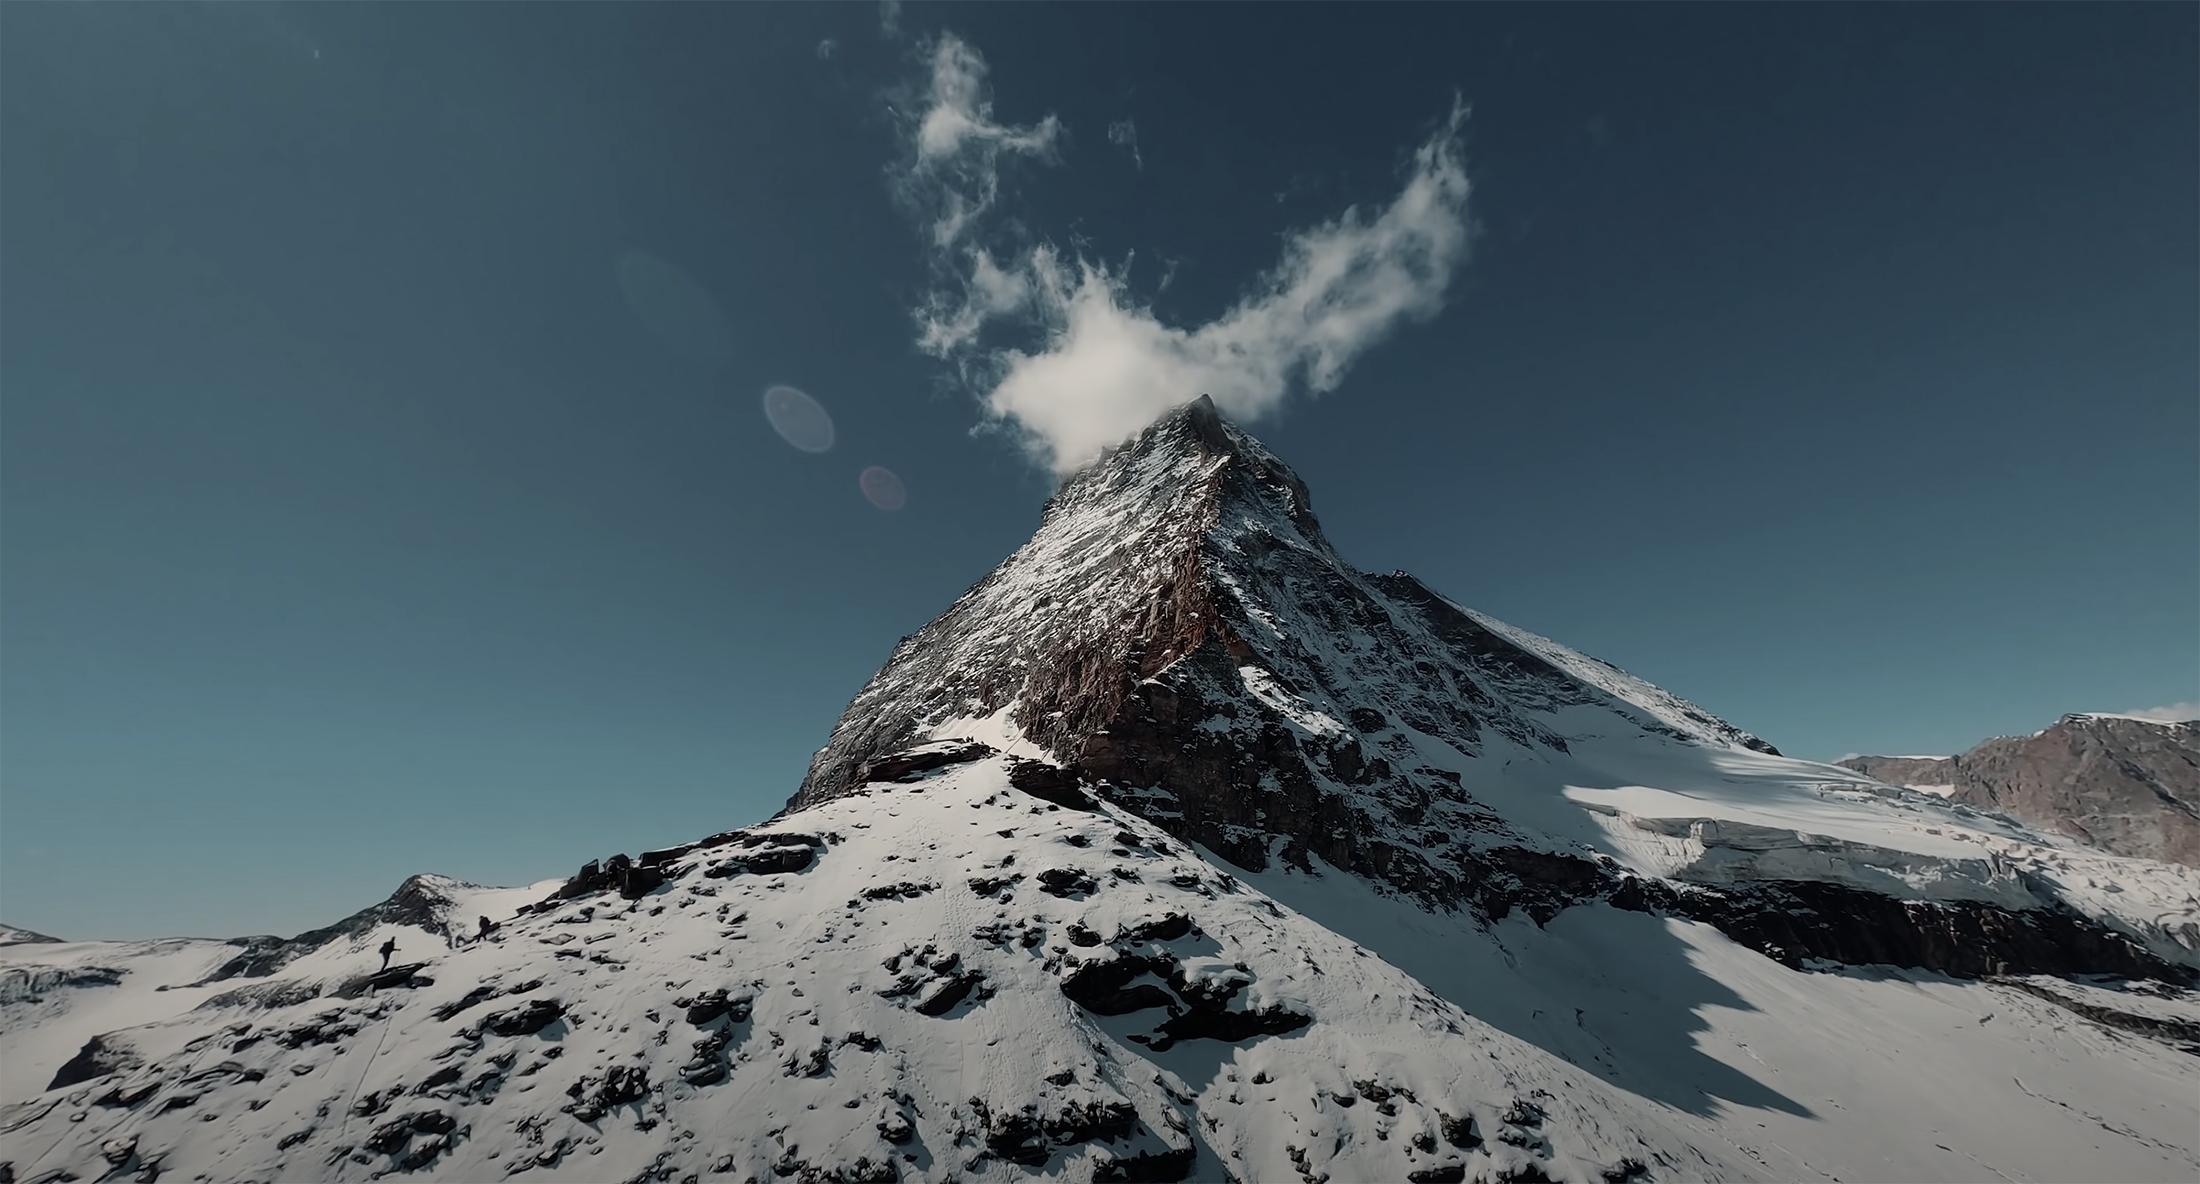 Ellis van Jason Matterhorn Drohne